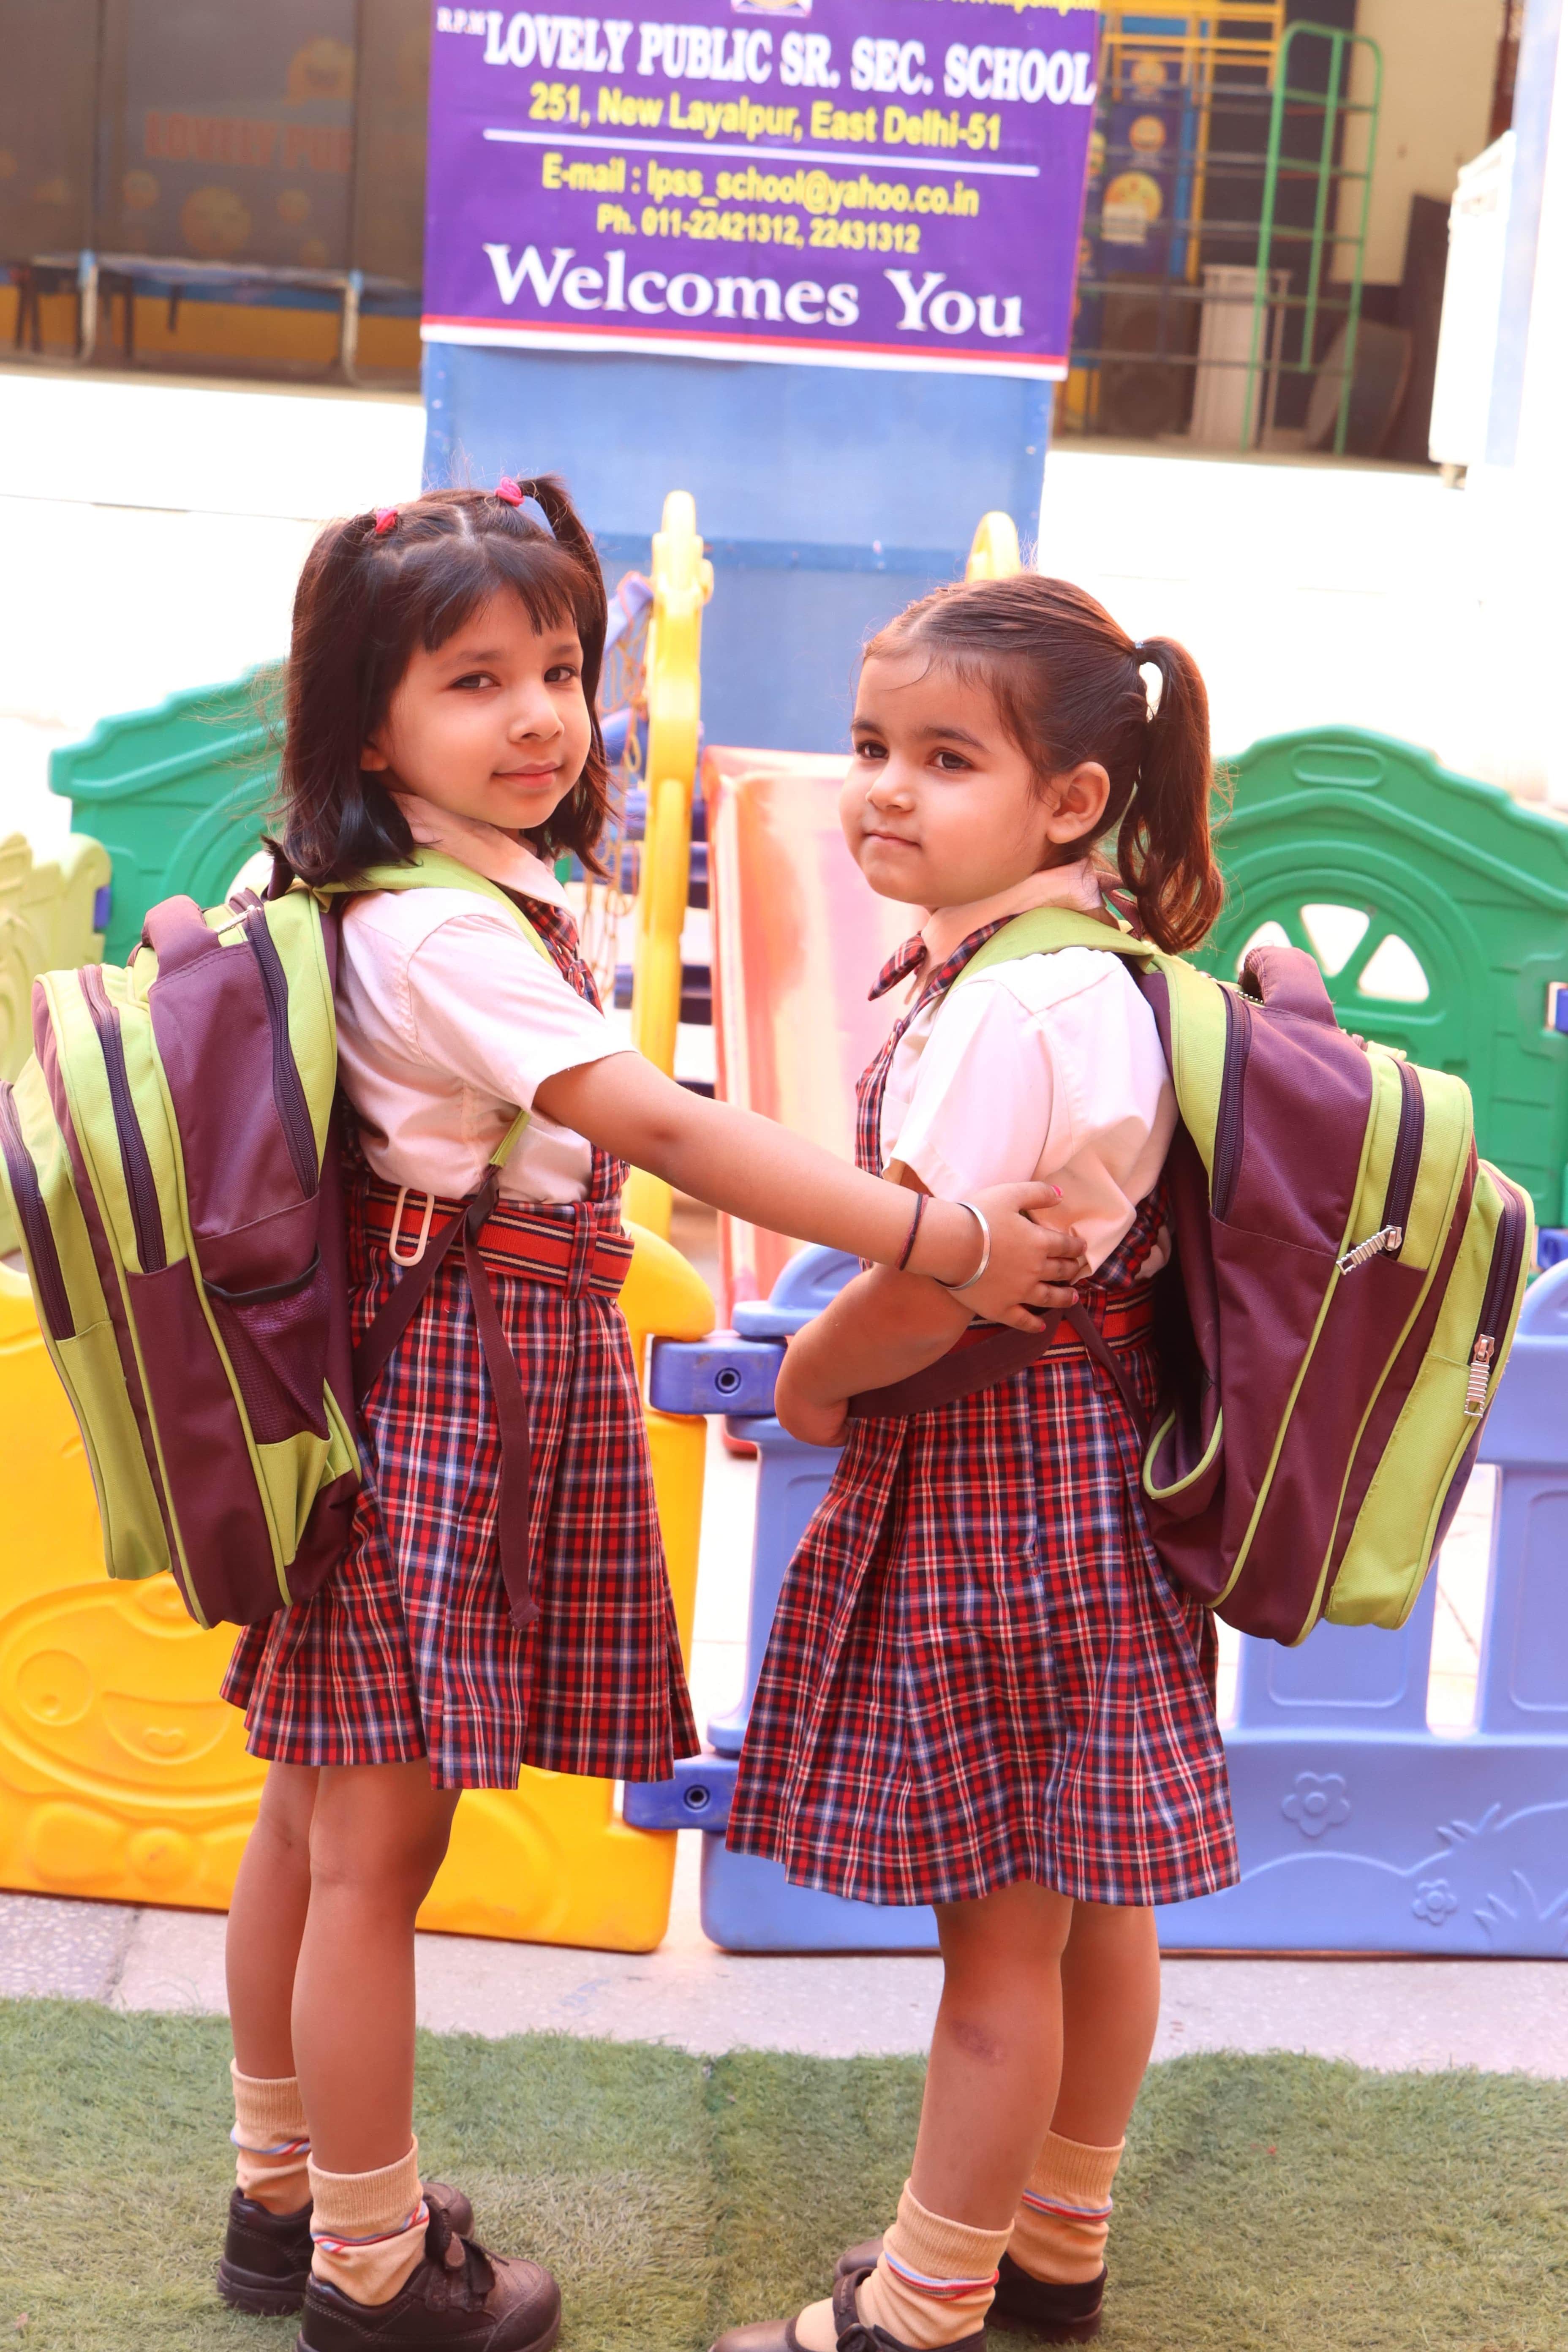 RPM Lovely Public Sr. Sec. School, New Layalpur1